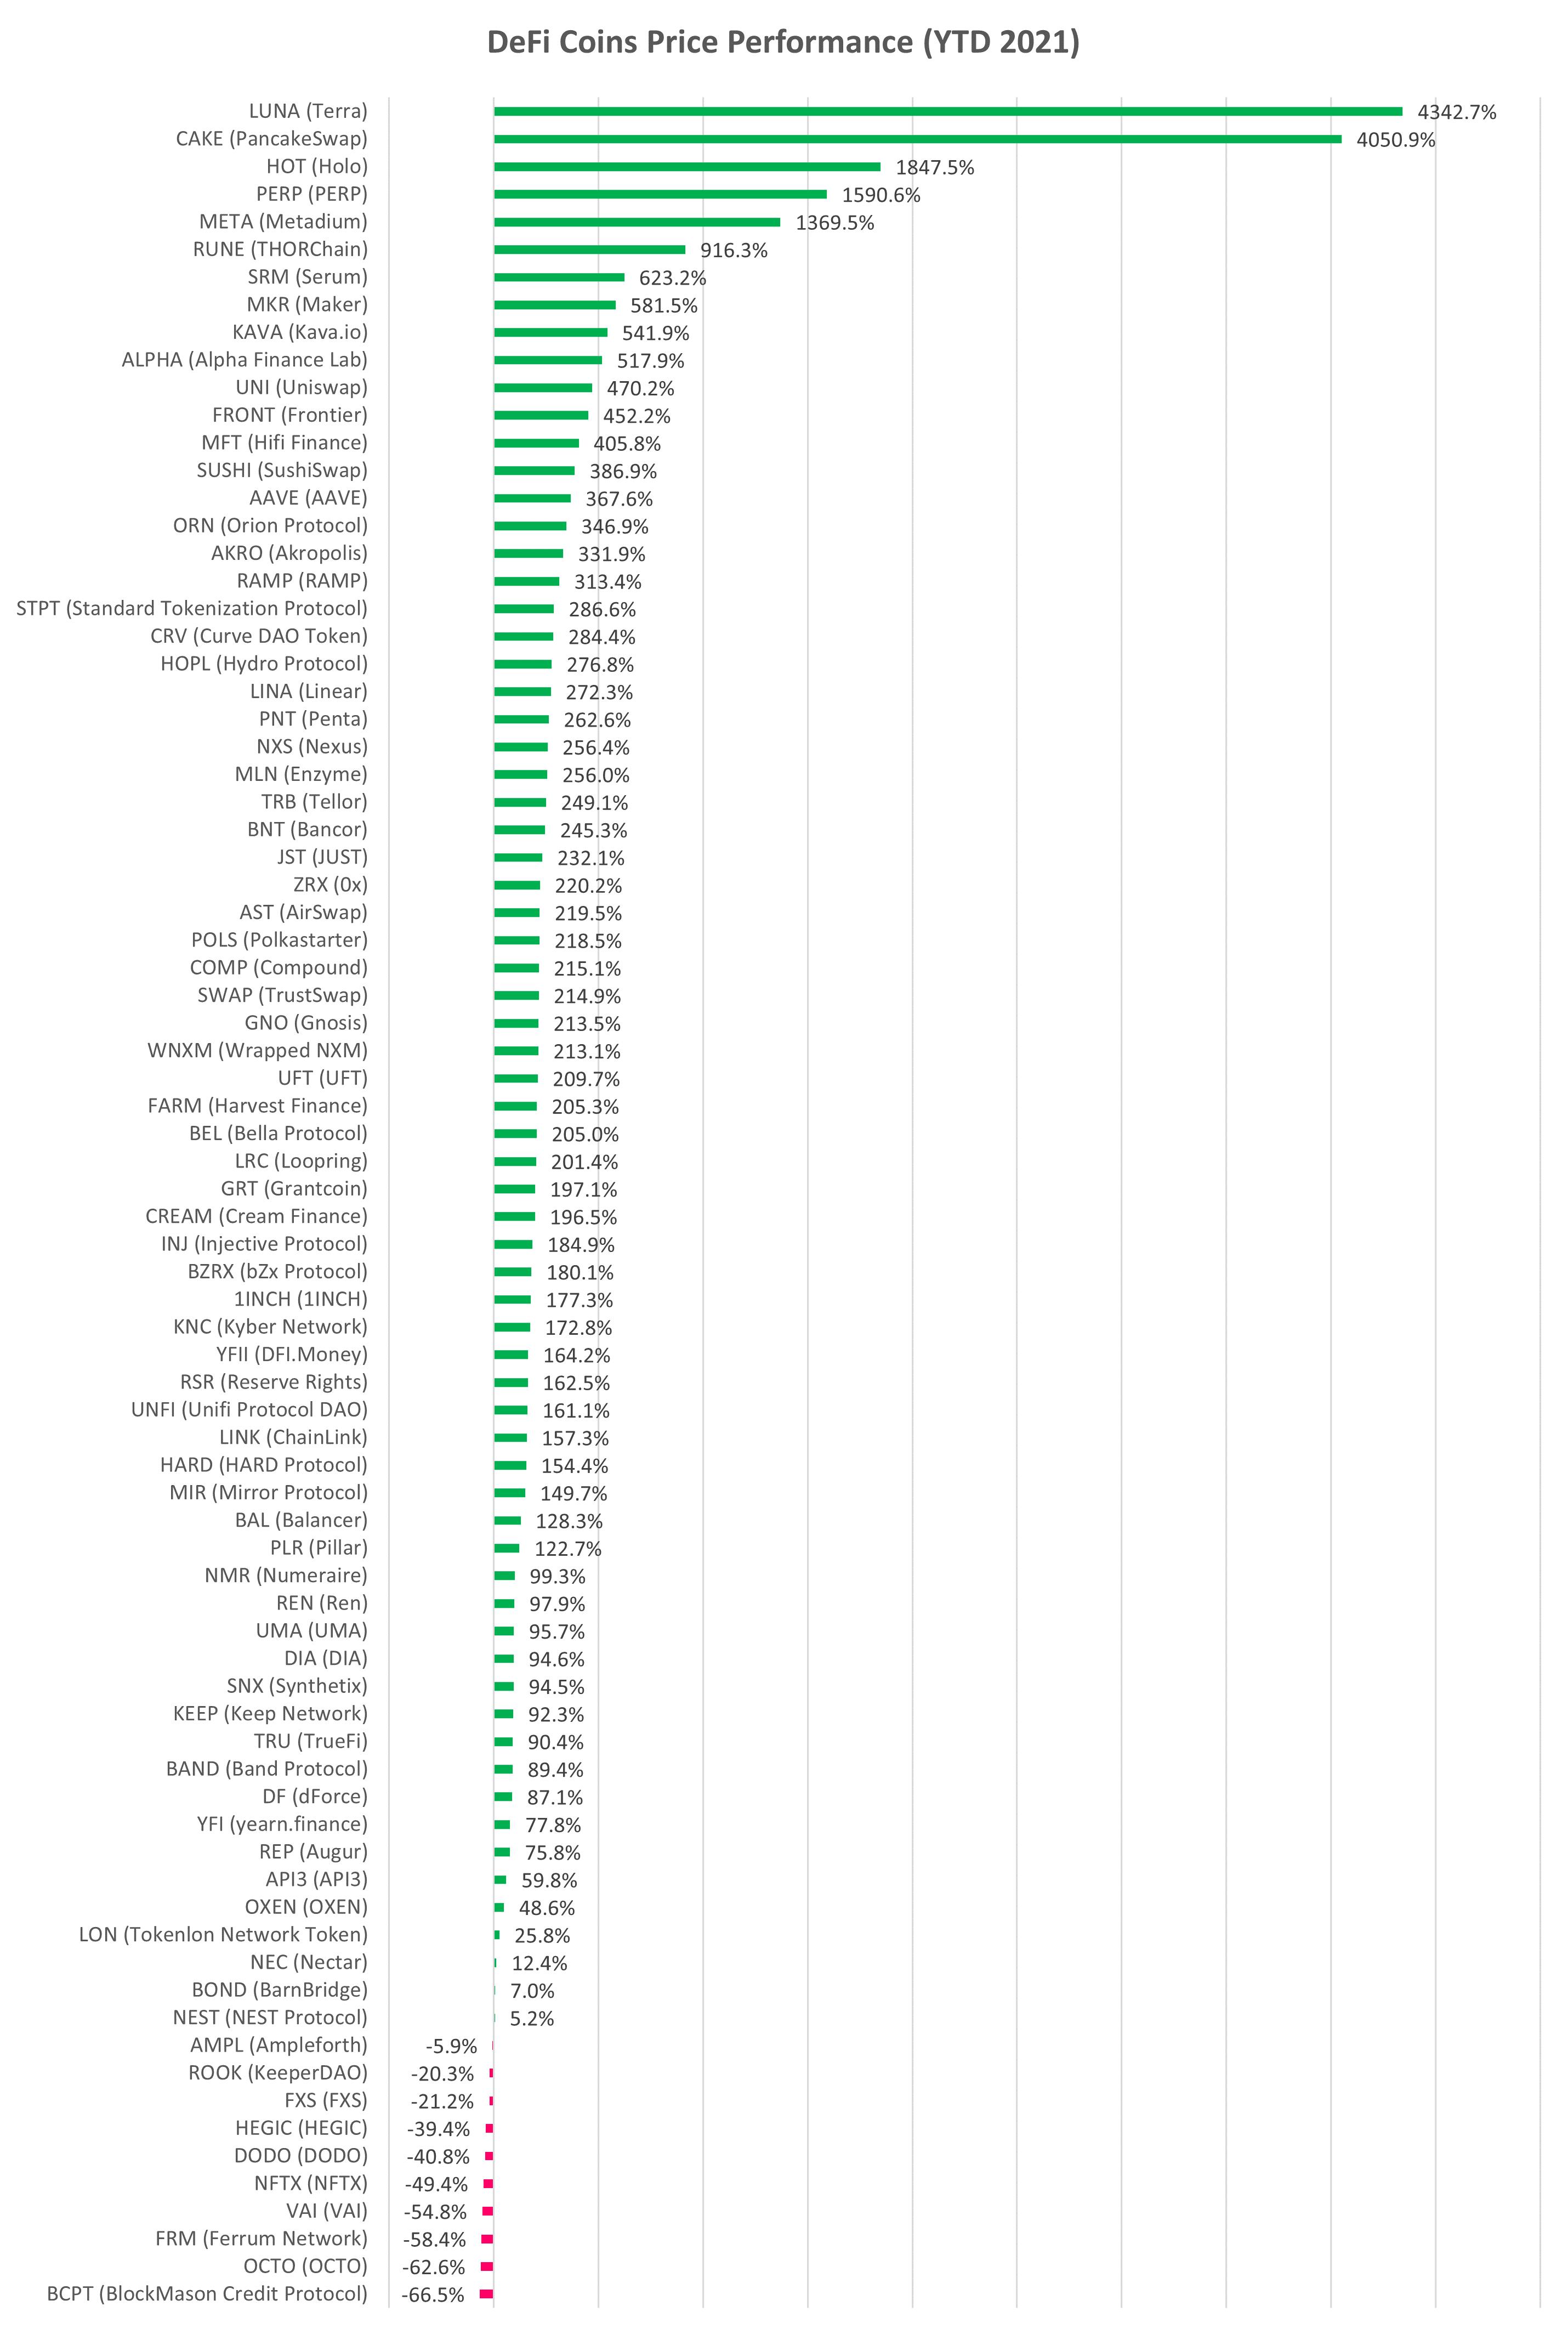 DeFi cryptocurrency YTD performance